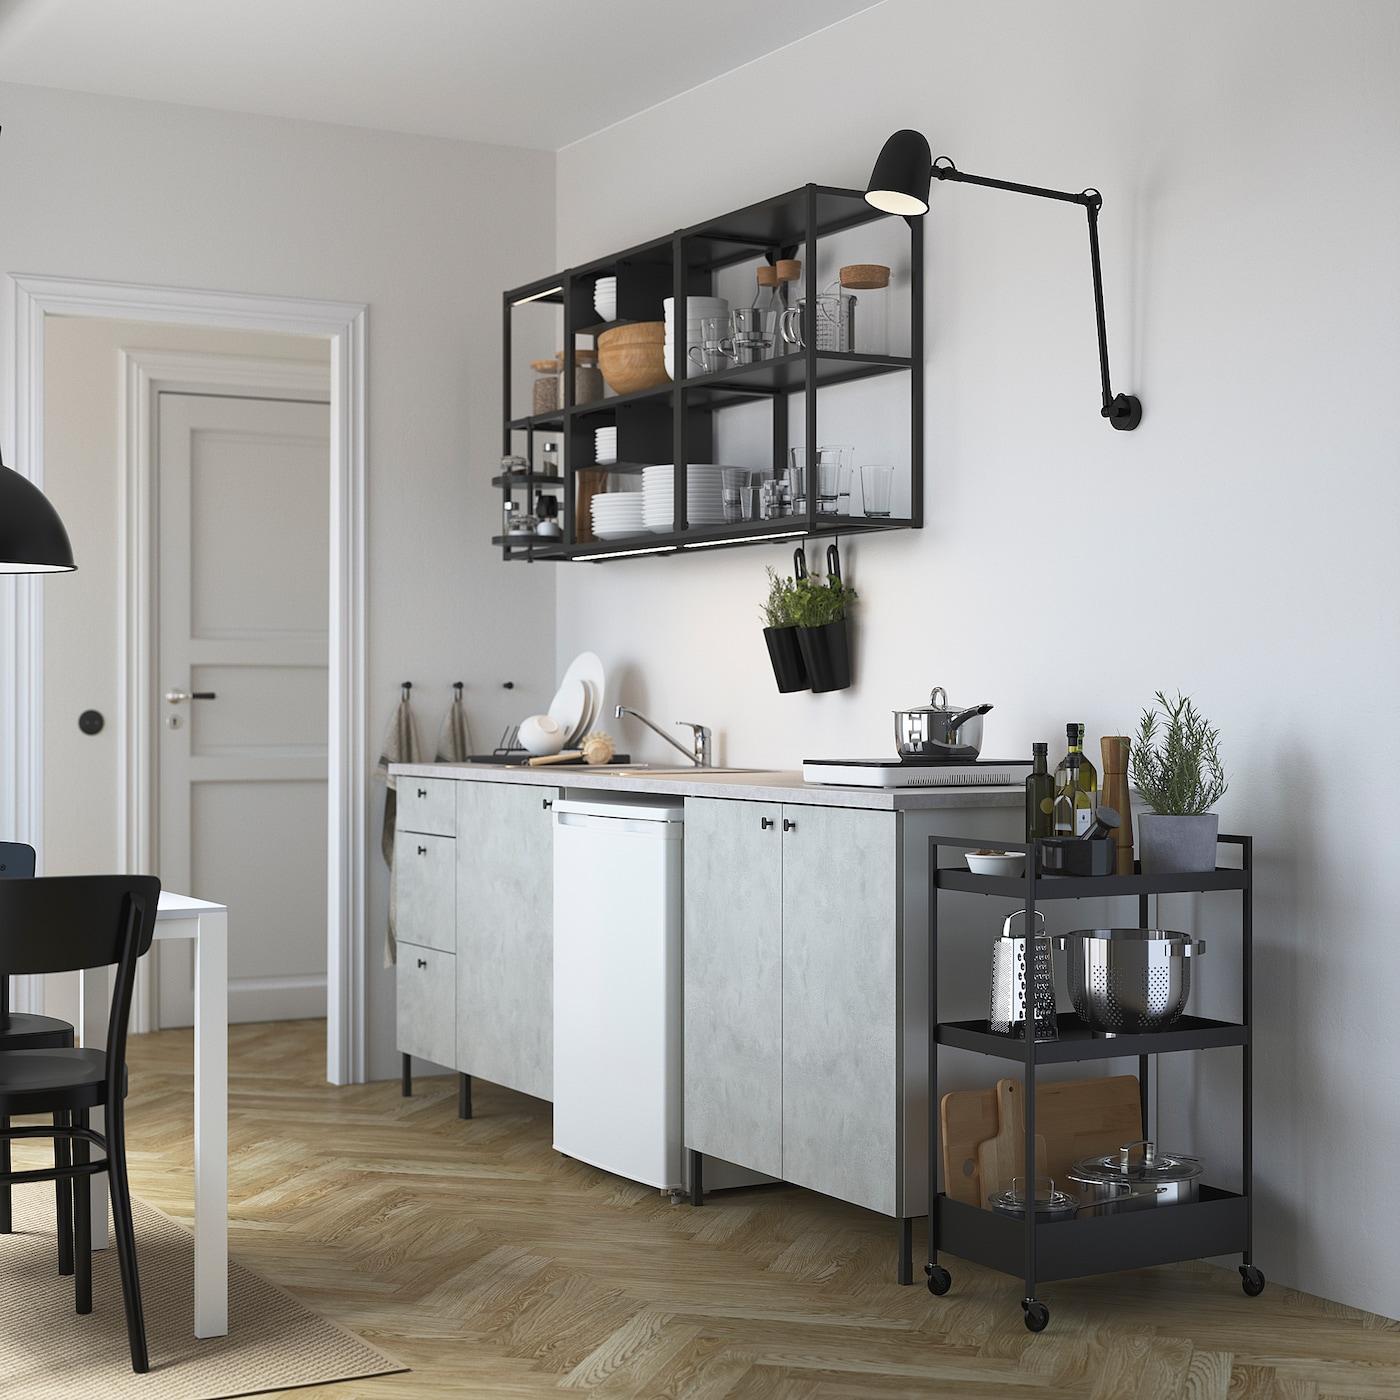 Picture of: Enhet Kokken Antracit Betonmonstret Ikea